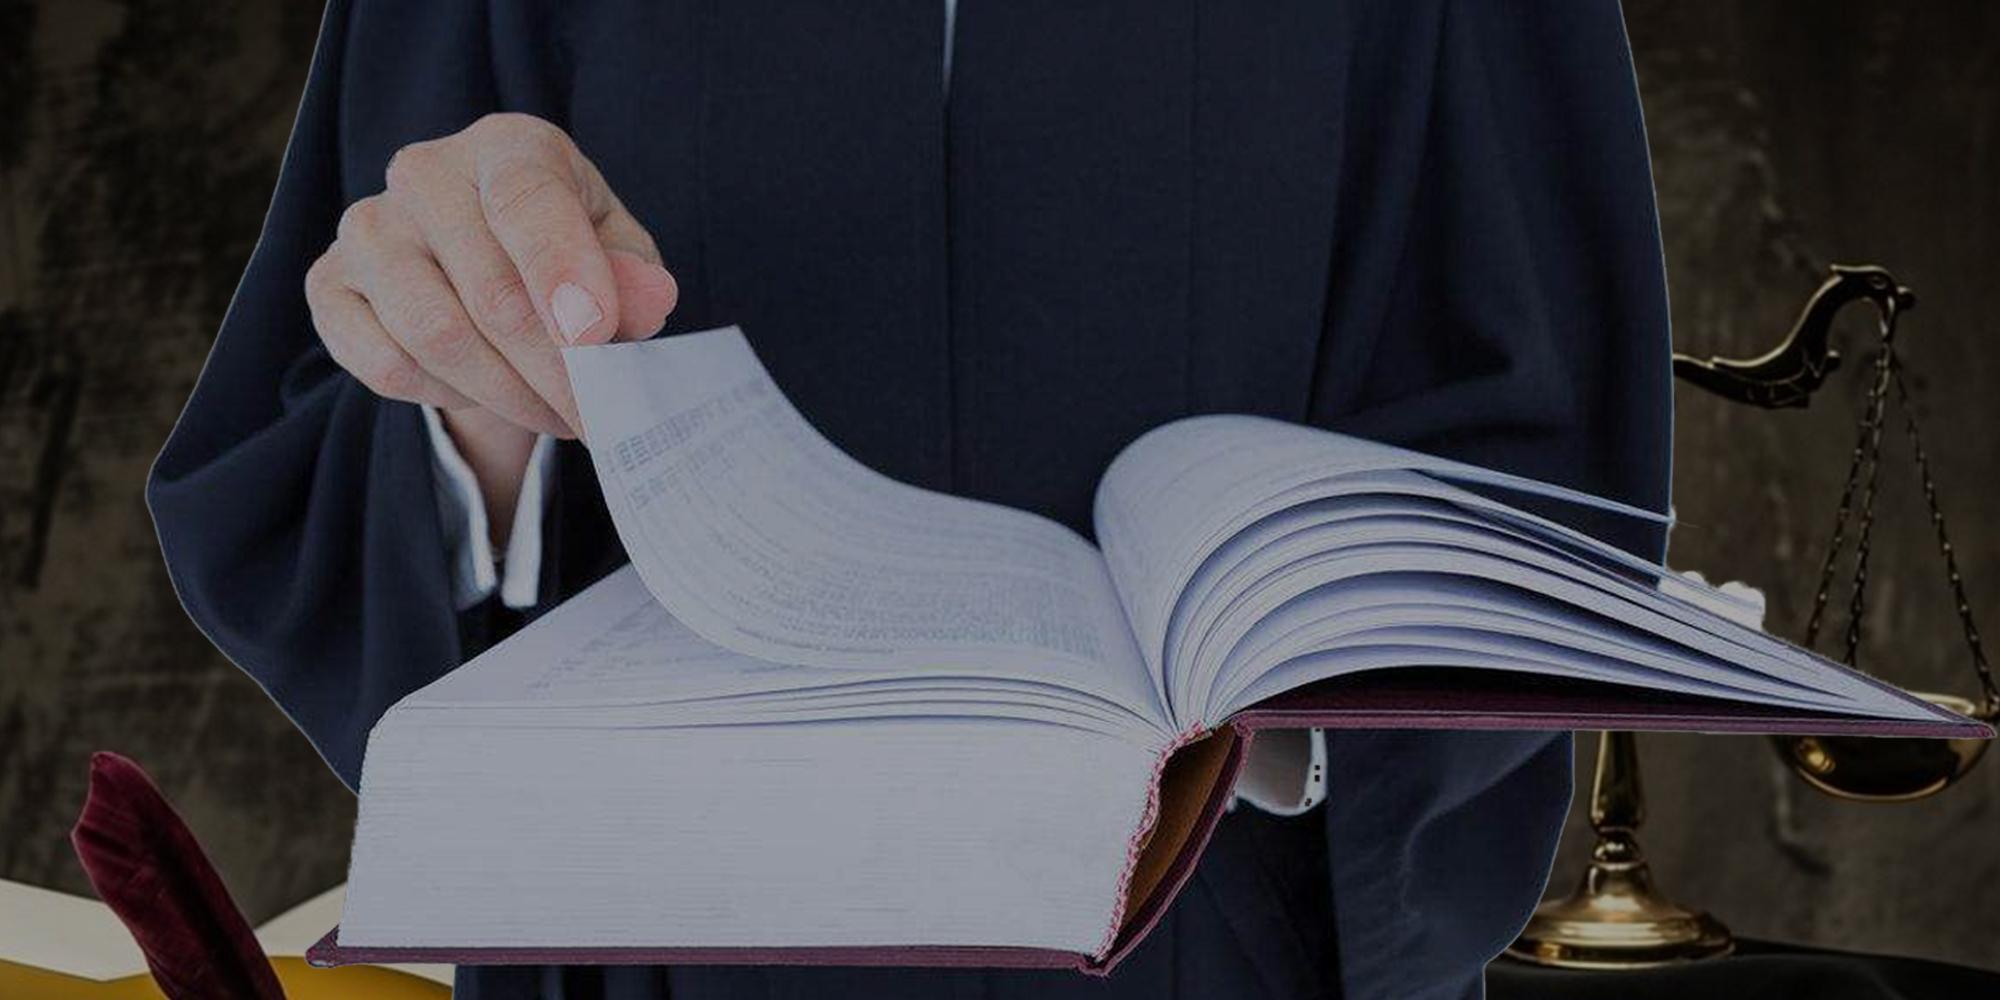 <p>谦明律师</p><p>守德·求实·敬业·创新</p>